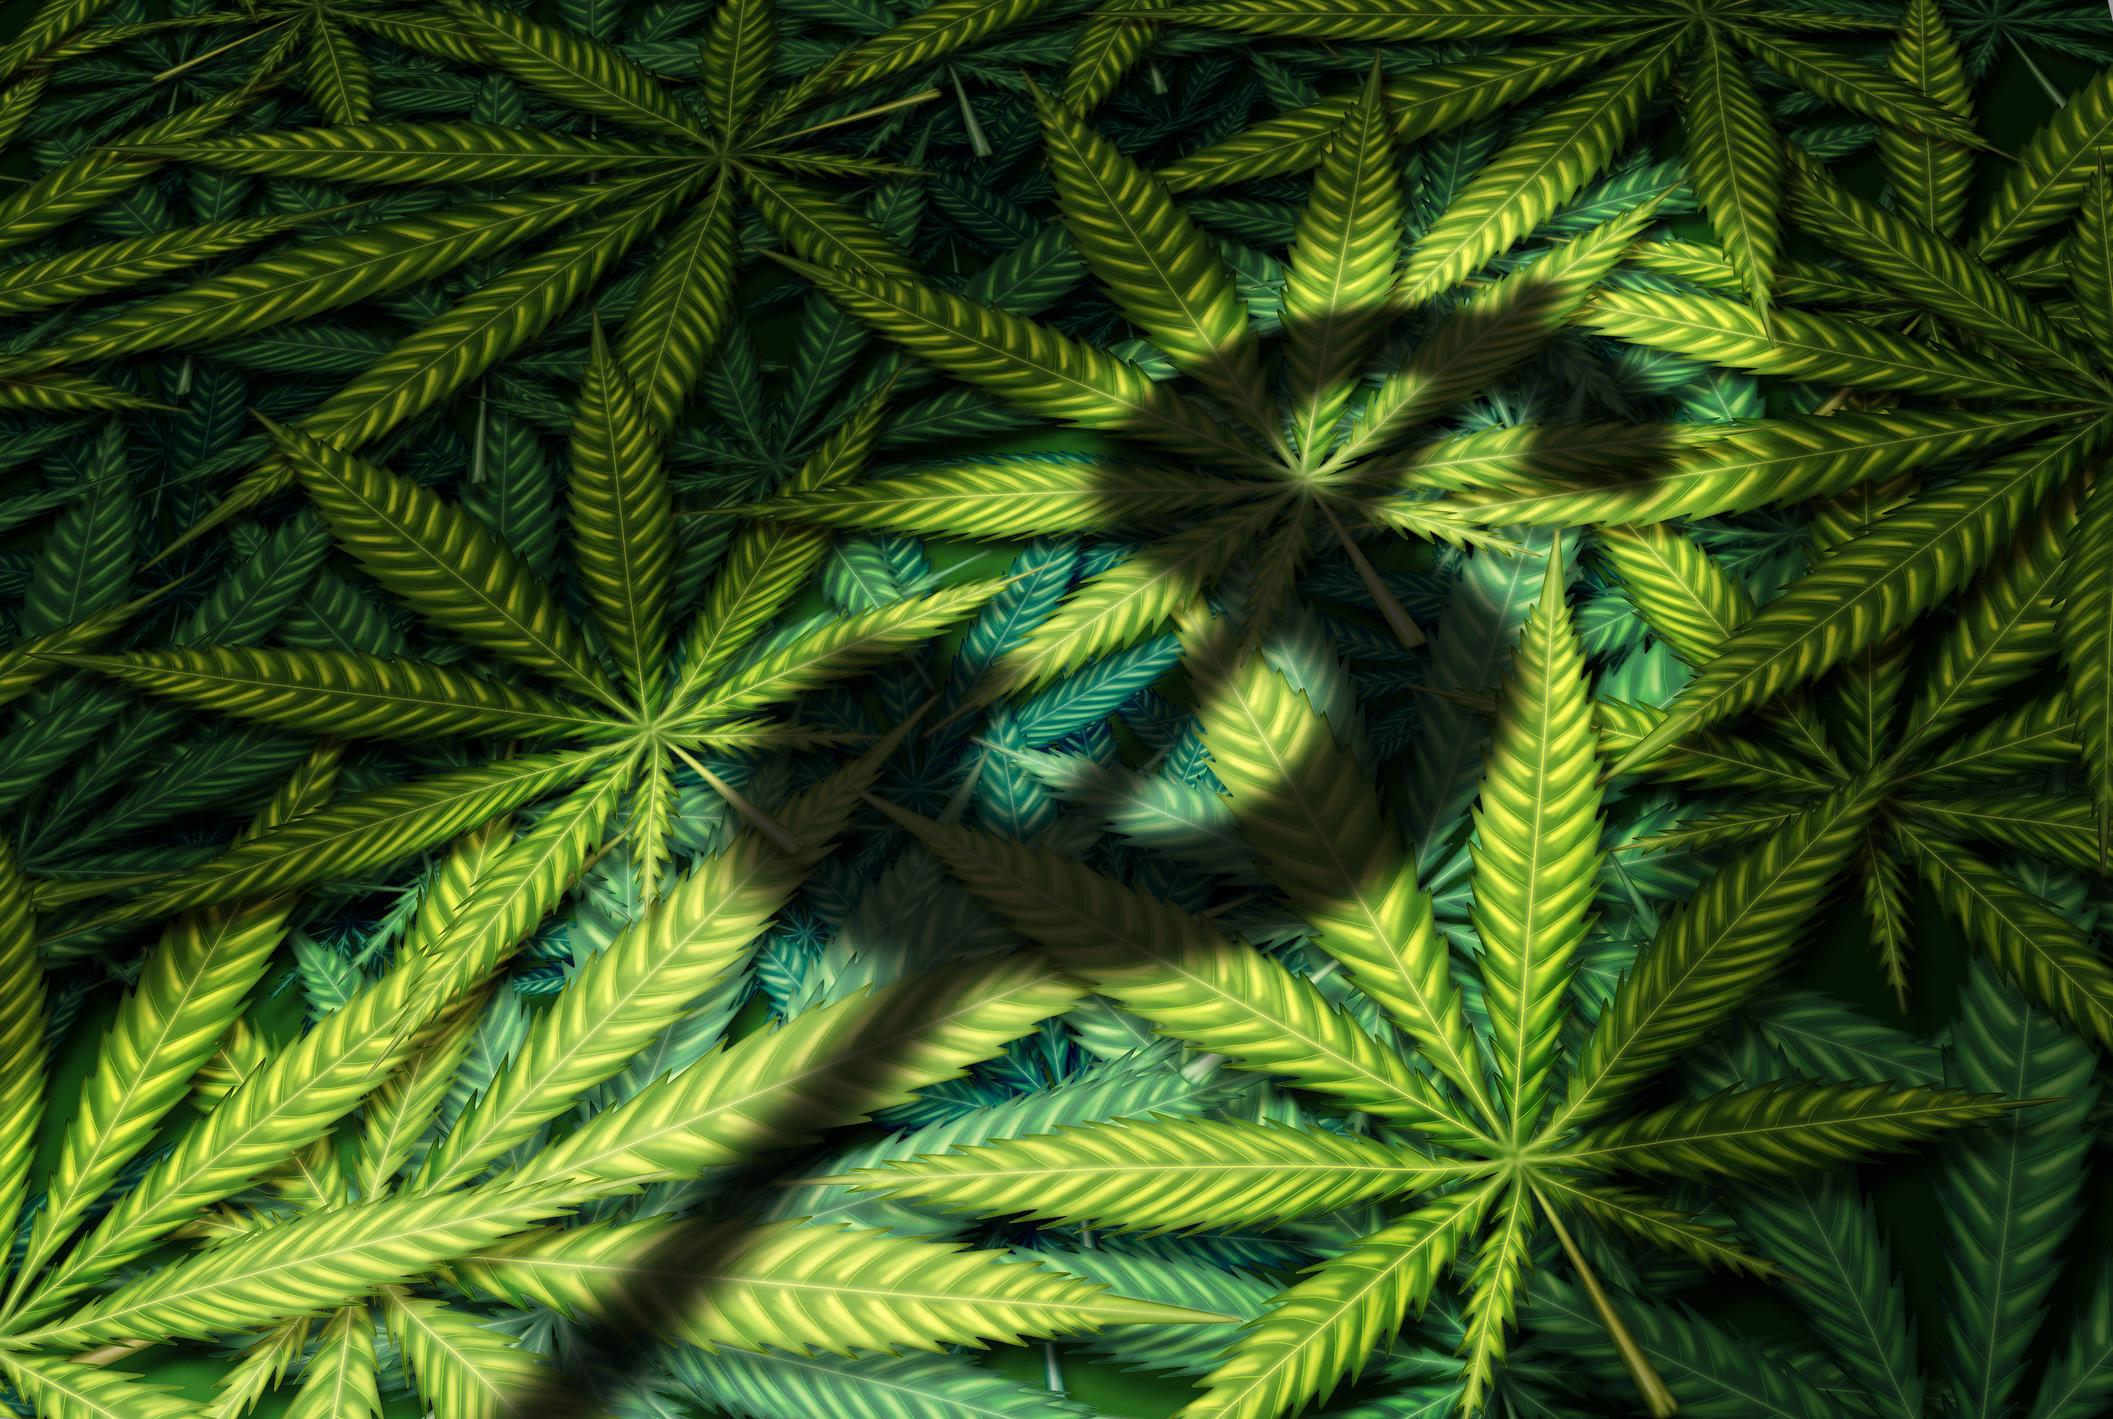 Better Marijuana Stock: HEXO vs  The Green Organic Dutchman